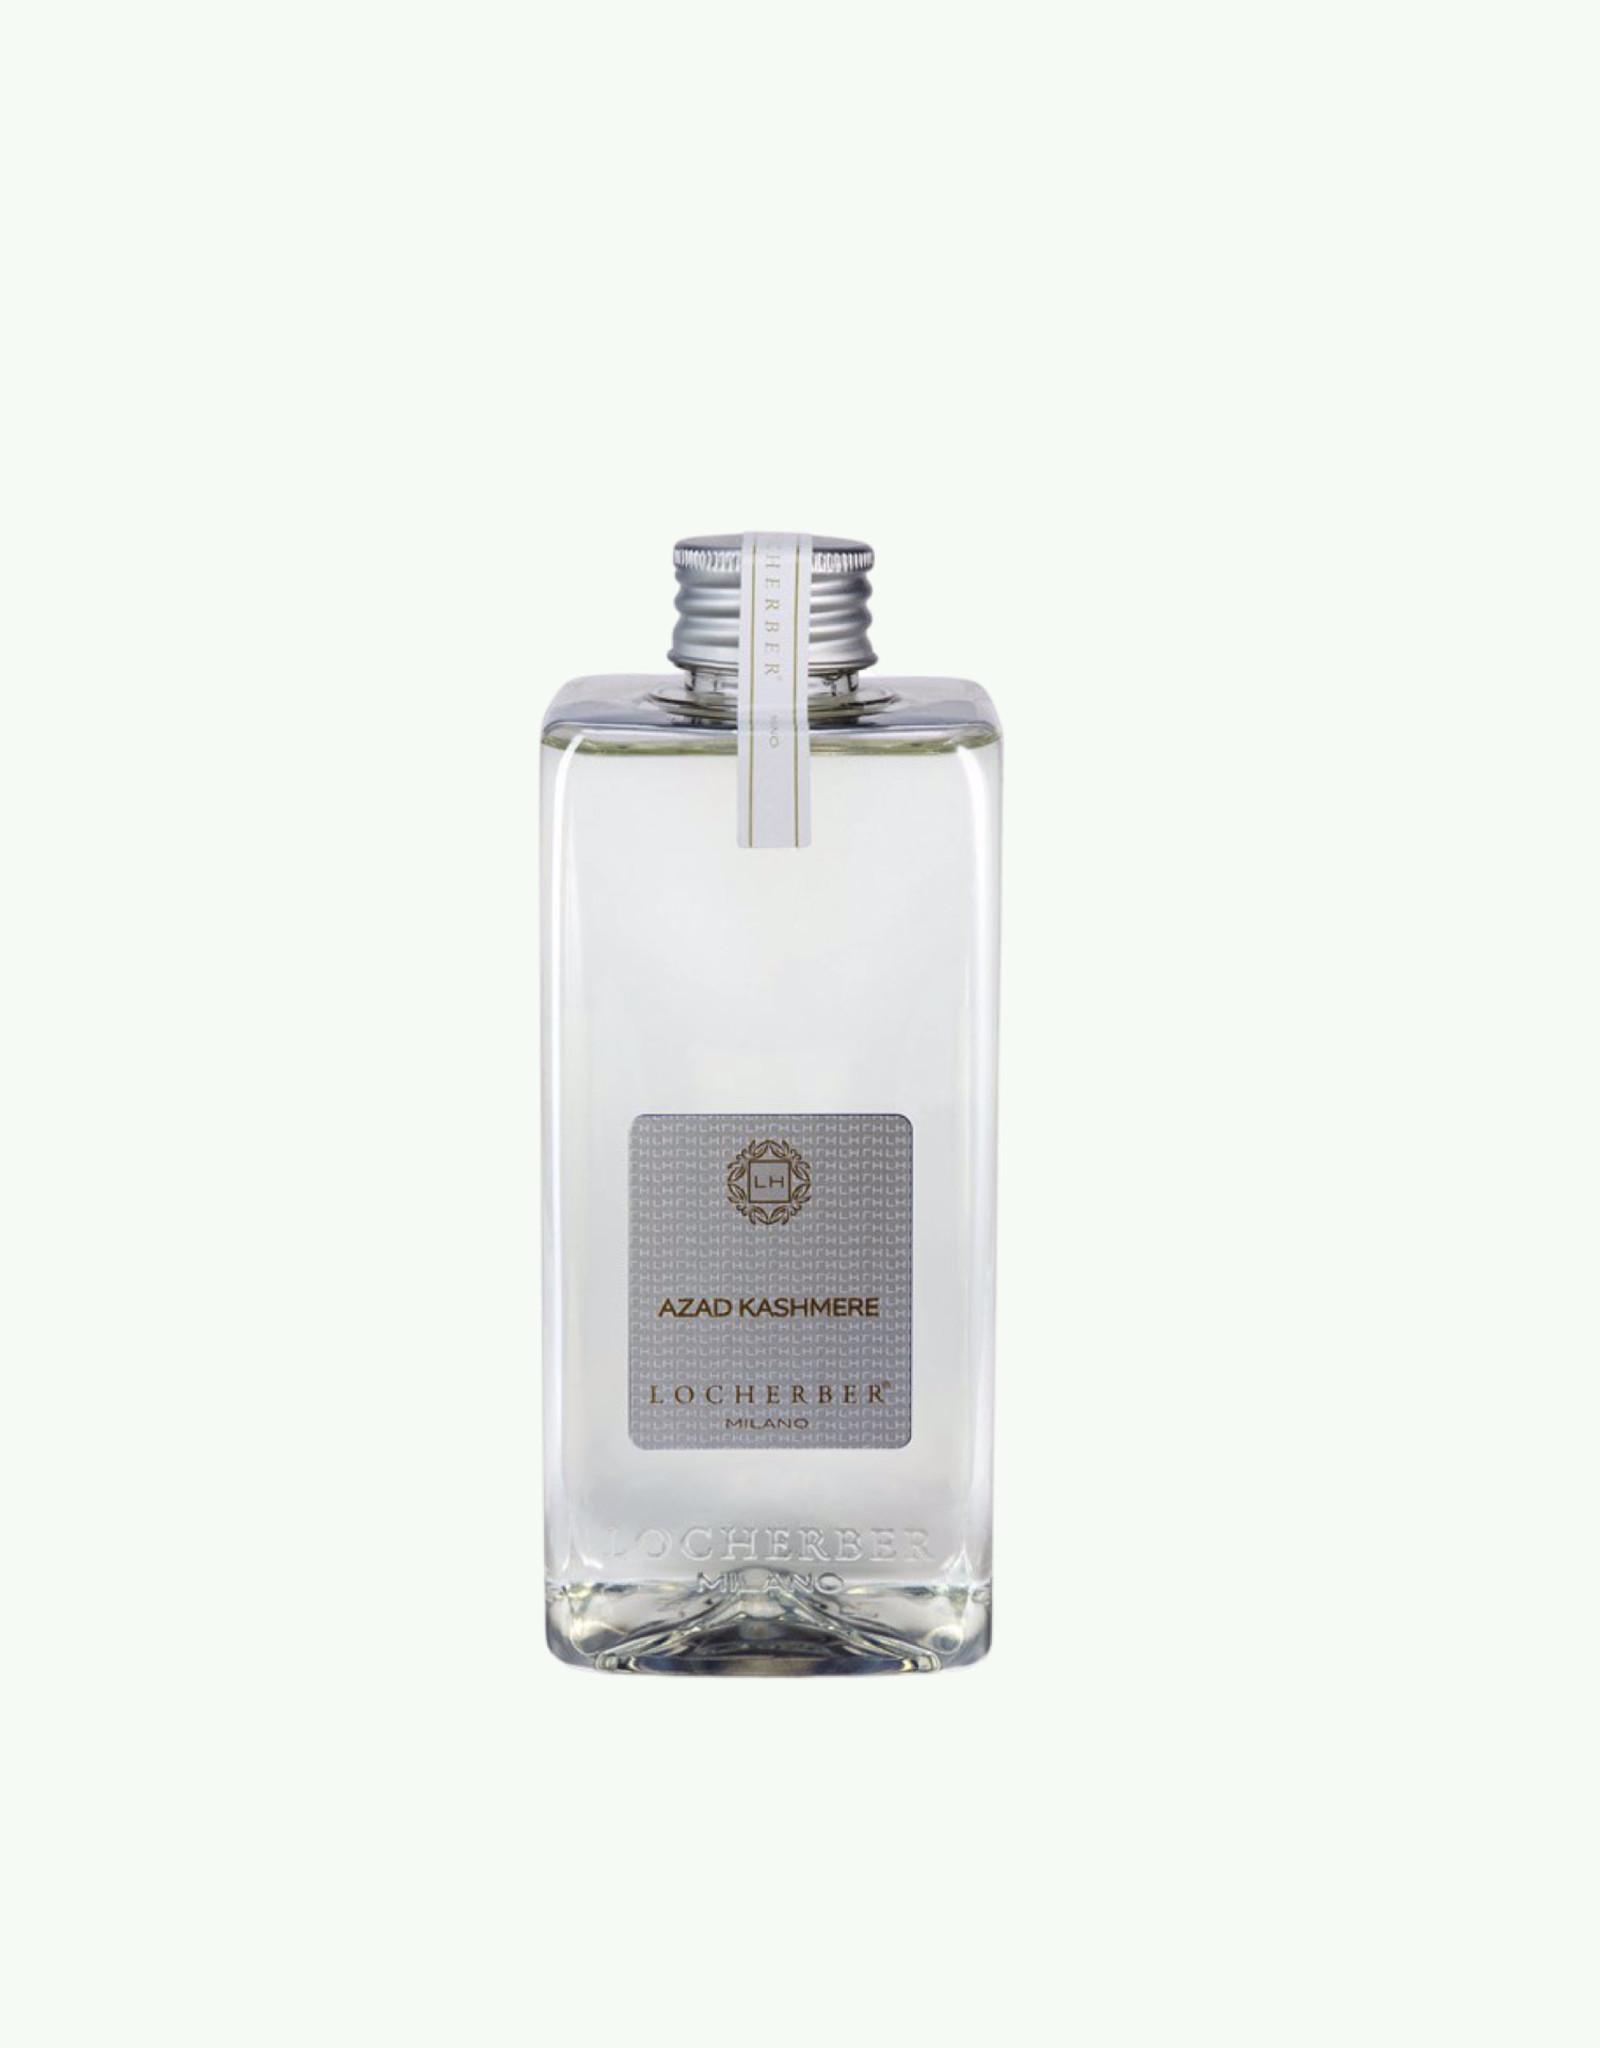 Locherber Locherber - Azad Kashmere - Bouteille de recharge 500 ml